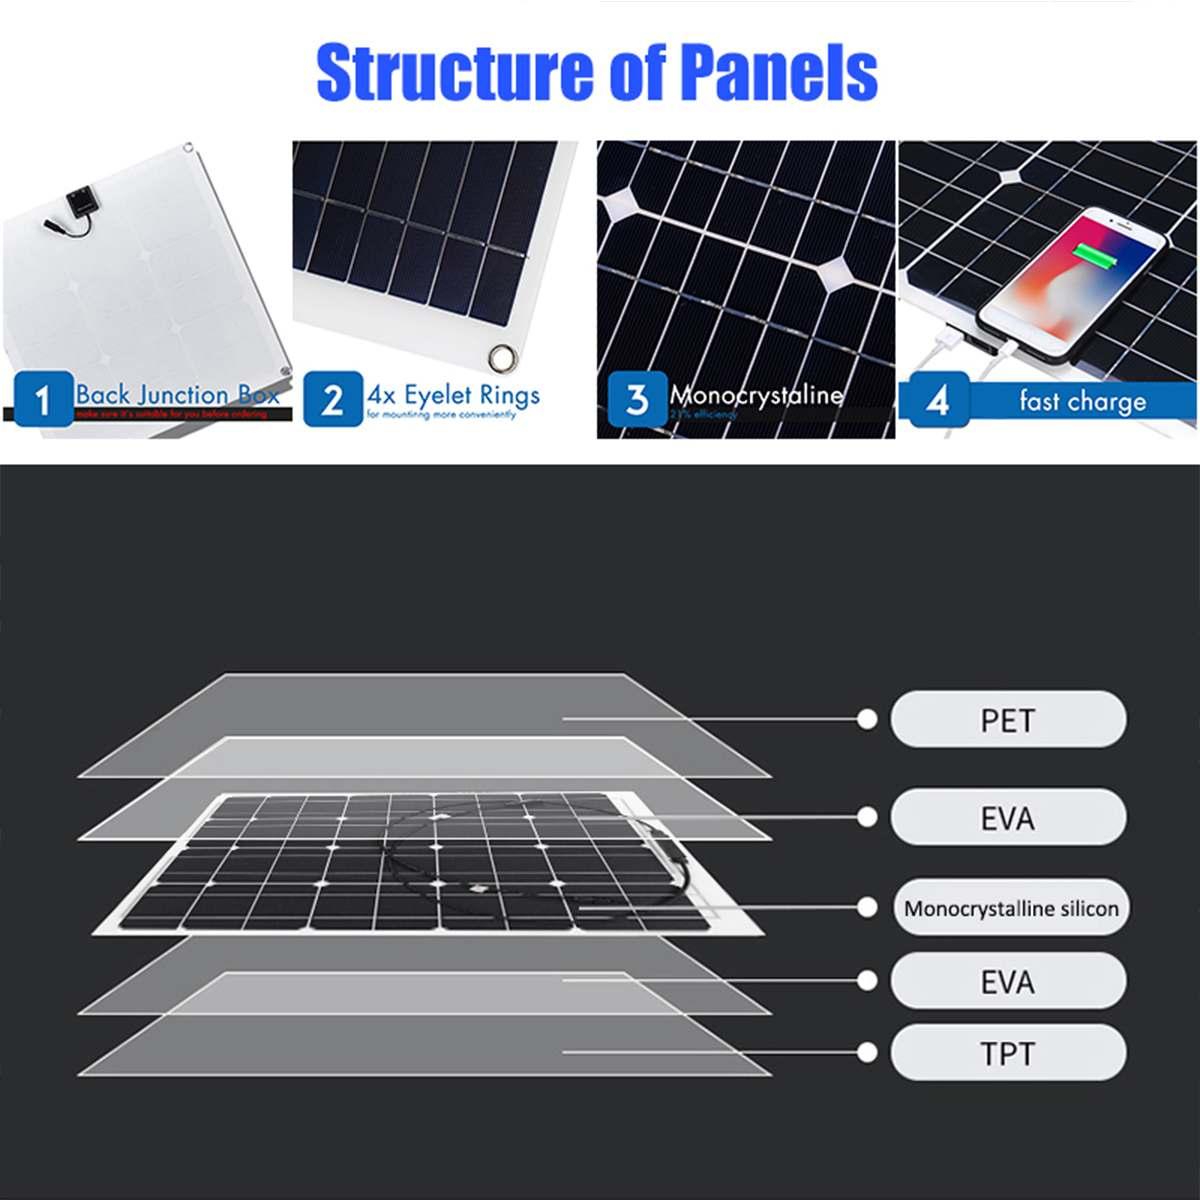 Nuevo Panel Solar de 200W 18V 5V Flexible de silicio monocristalino con controlador de 10/20/30A para batería Solar al aire libre - 5